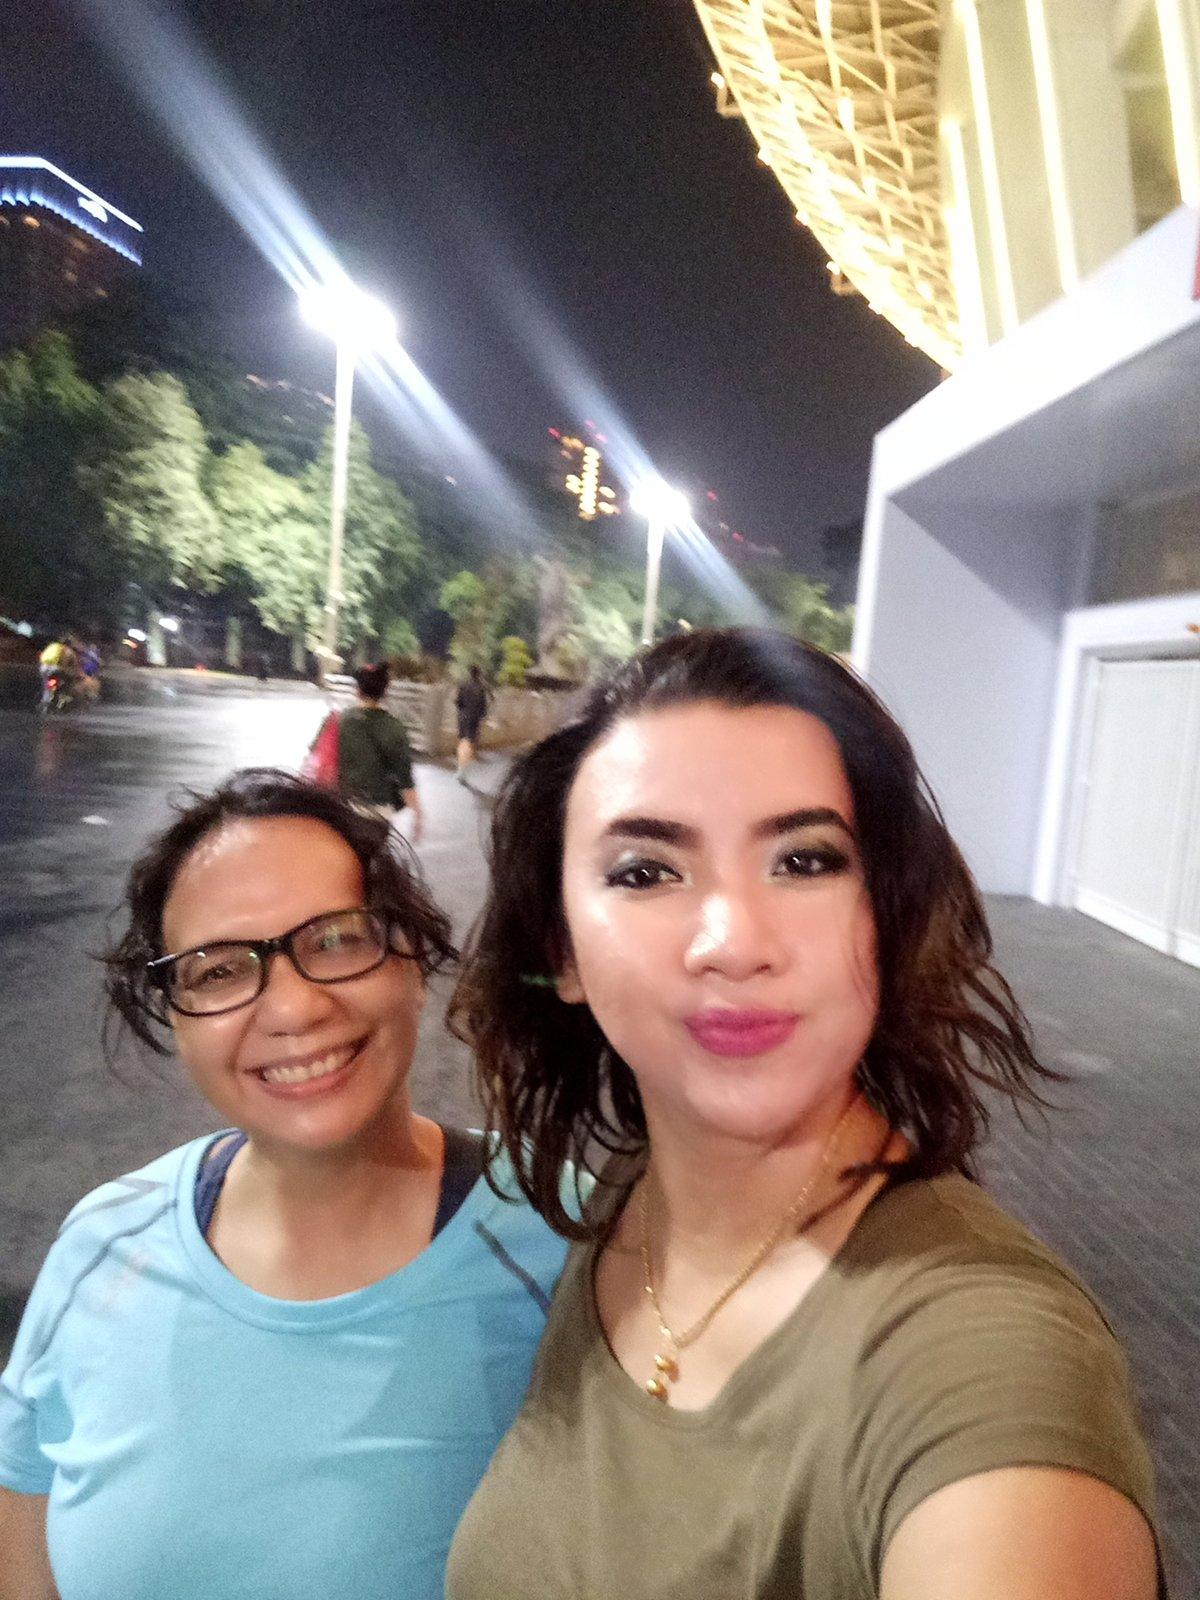 First time running! Enjoying the new GBK stadium #runner #Jakarta https://t.co/64vWJBQx0Y